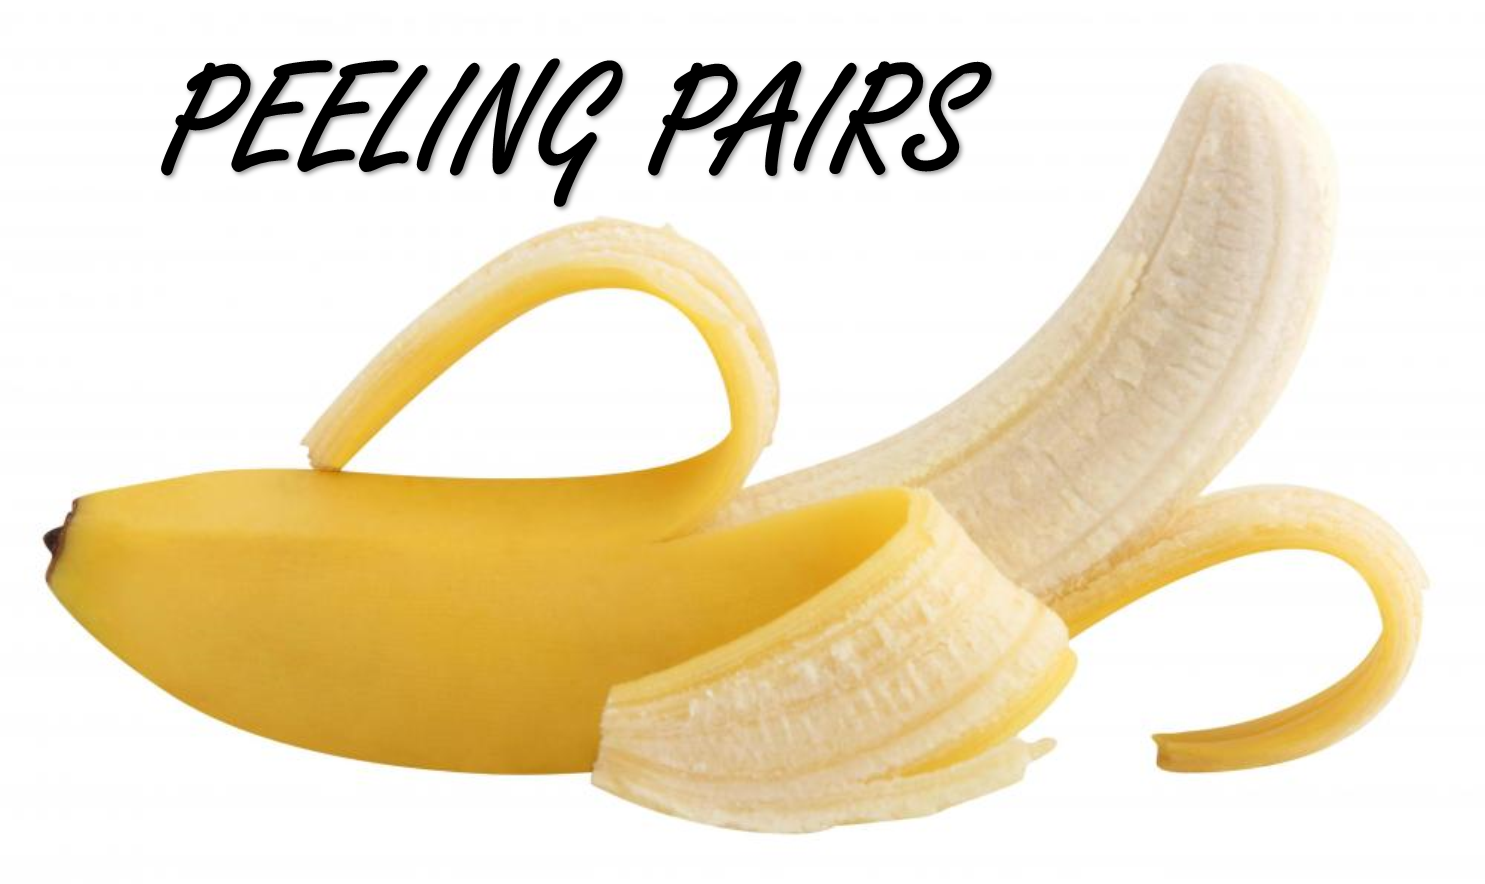 Peeling Pairs Stumingames Unripe Banana Banana Peel Banana